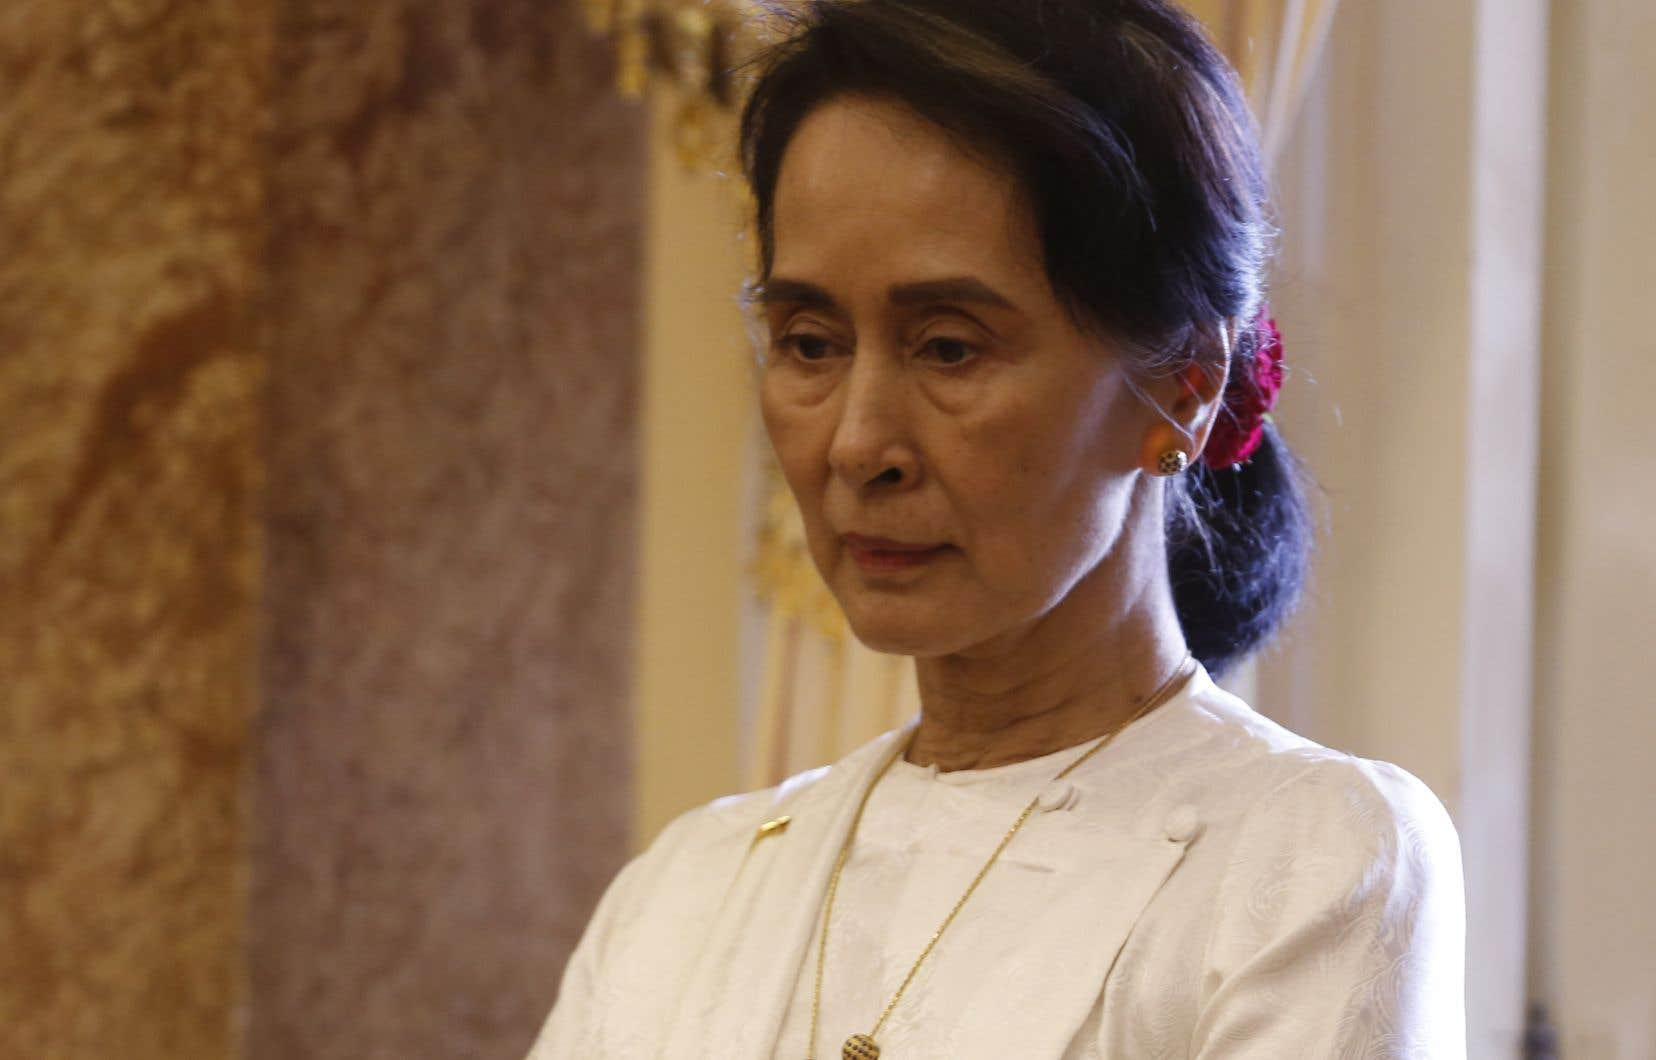 La dirigeante myanmaraise Aung San Suu Kyi